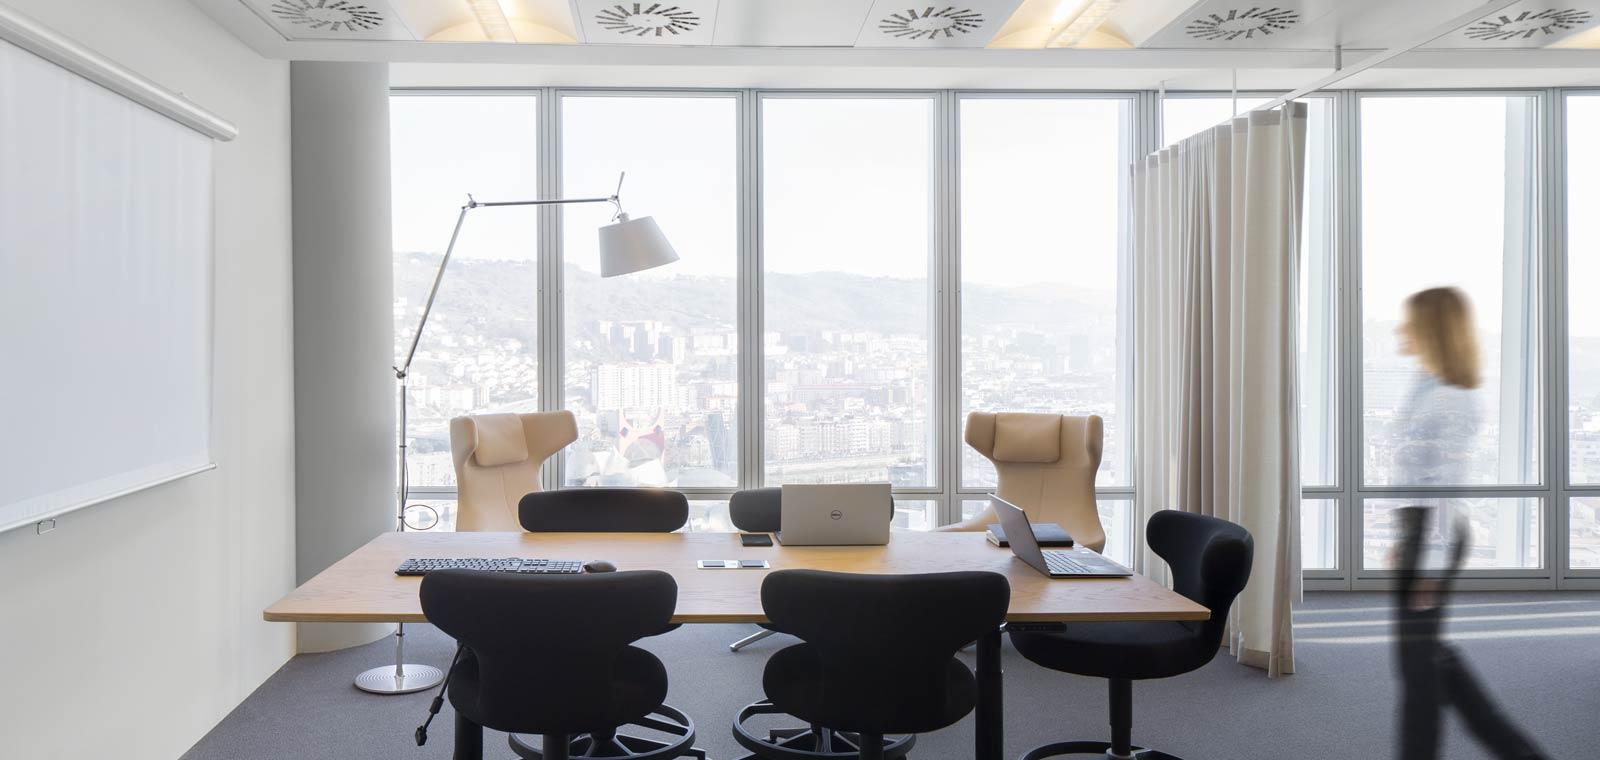 Oficina iberdrola bilbao excelente oficinas de iberdrola for Iberdrola oficinas bilbao